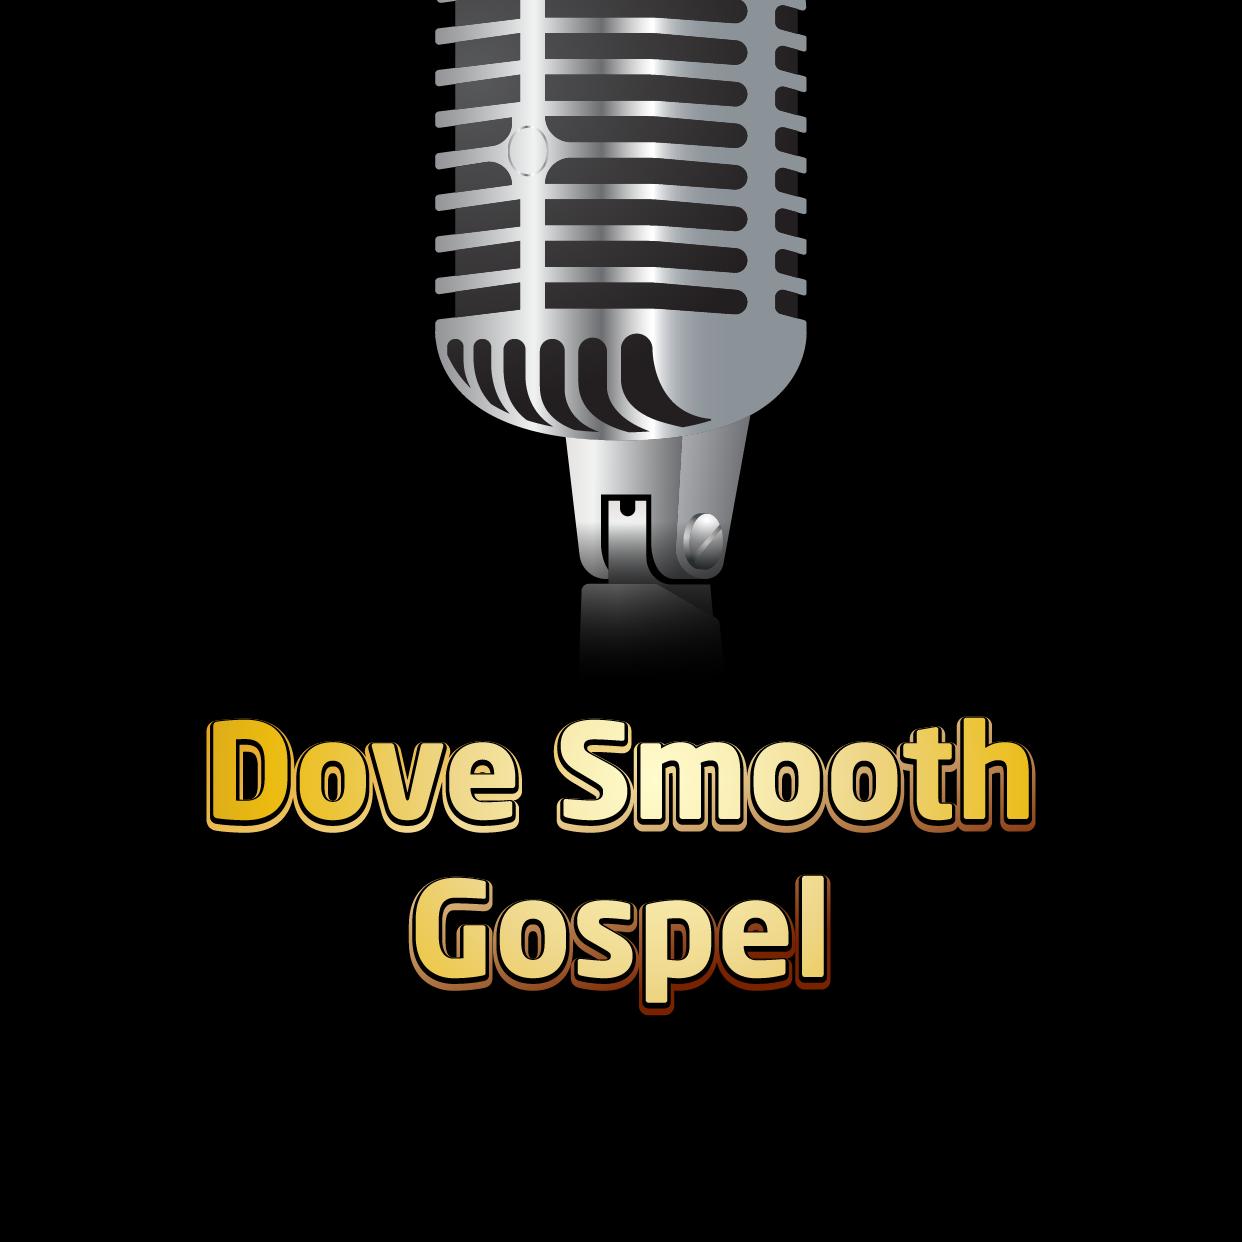 Dove Smooth Gospel 1